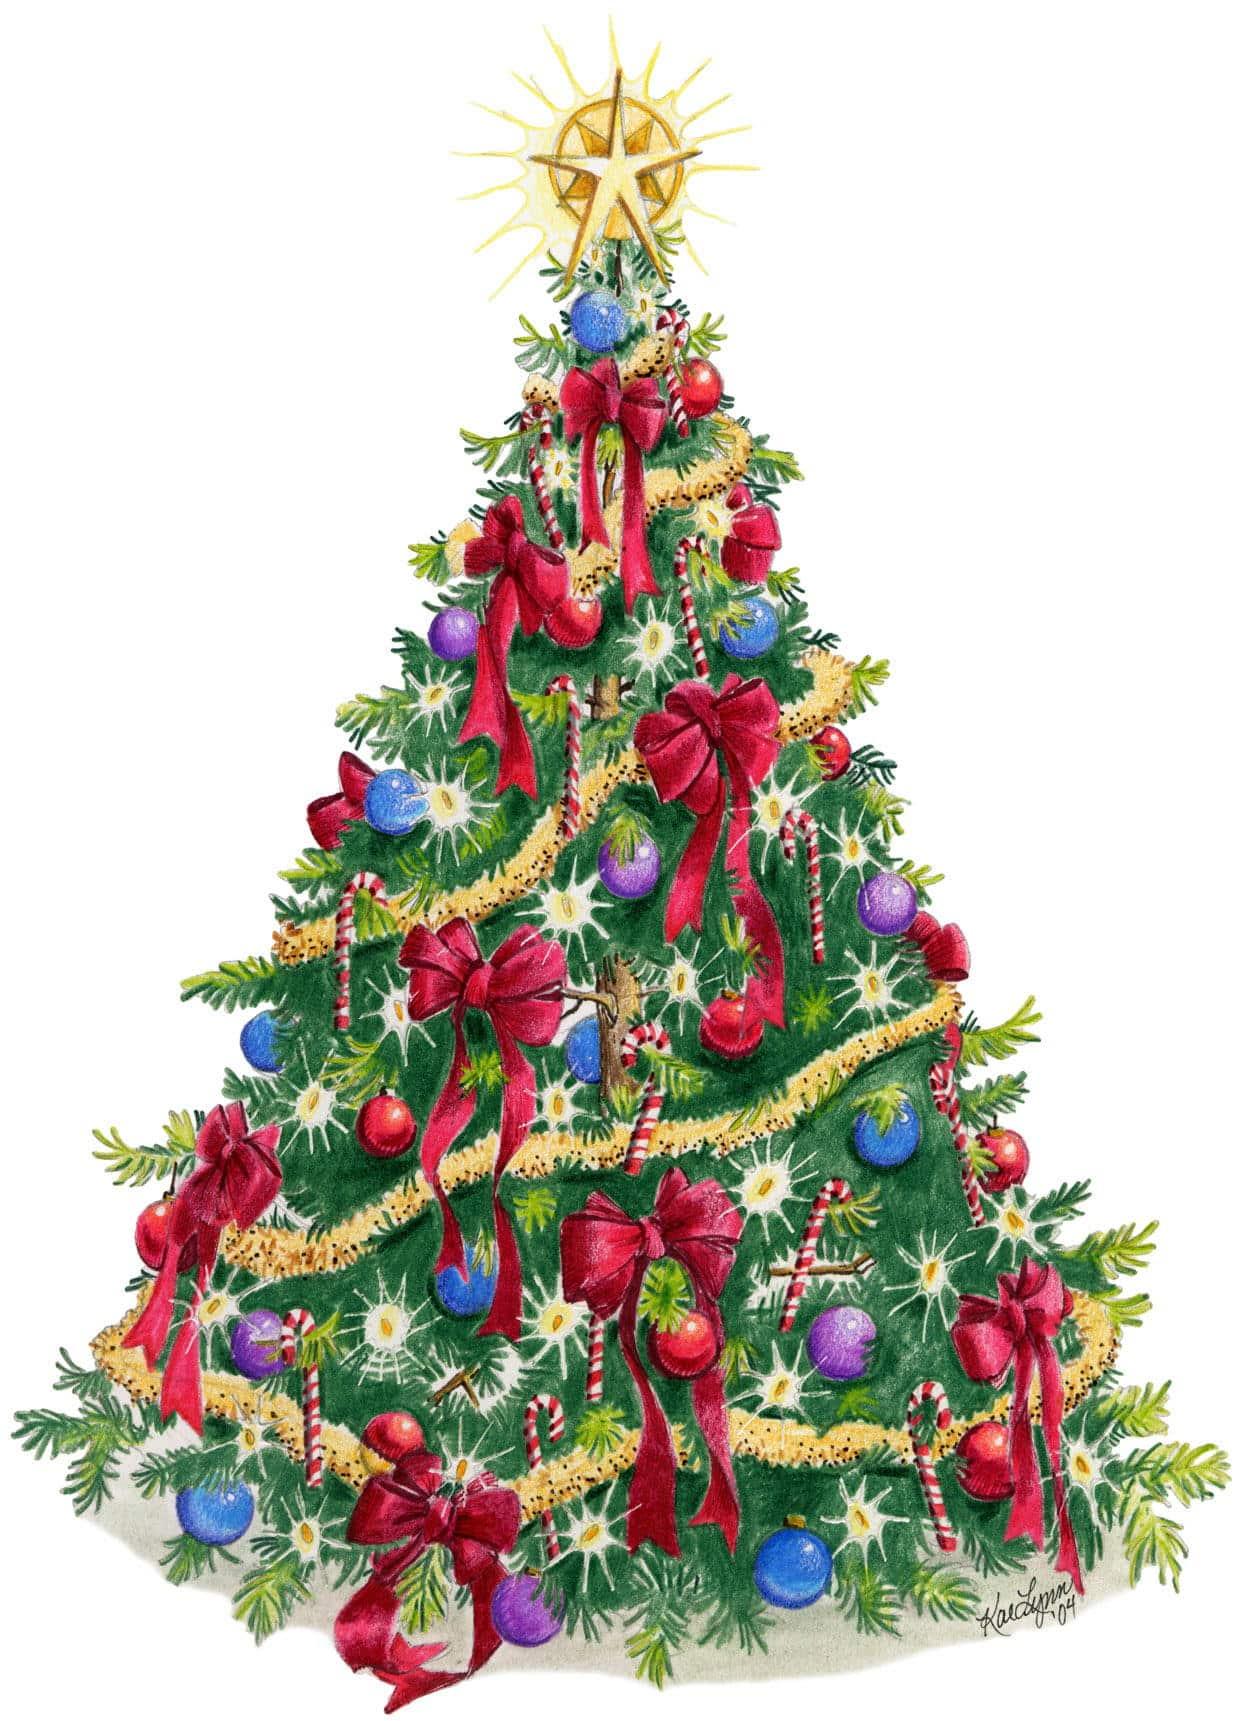 https://i2.wp.com/www.turnbacktogod.com/wp-content/uploads/2008/12/christmas-tree-pics-0111.jpg